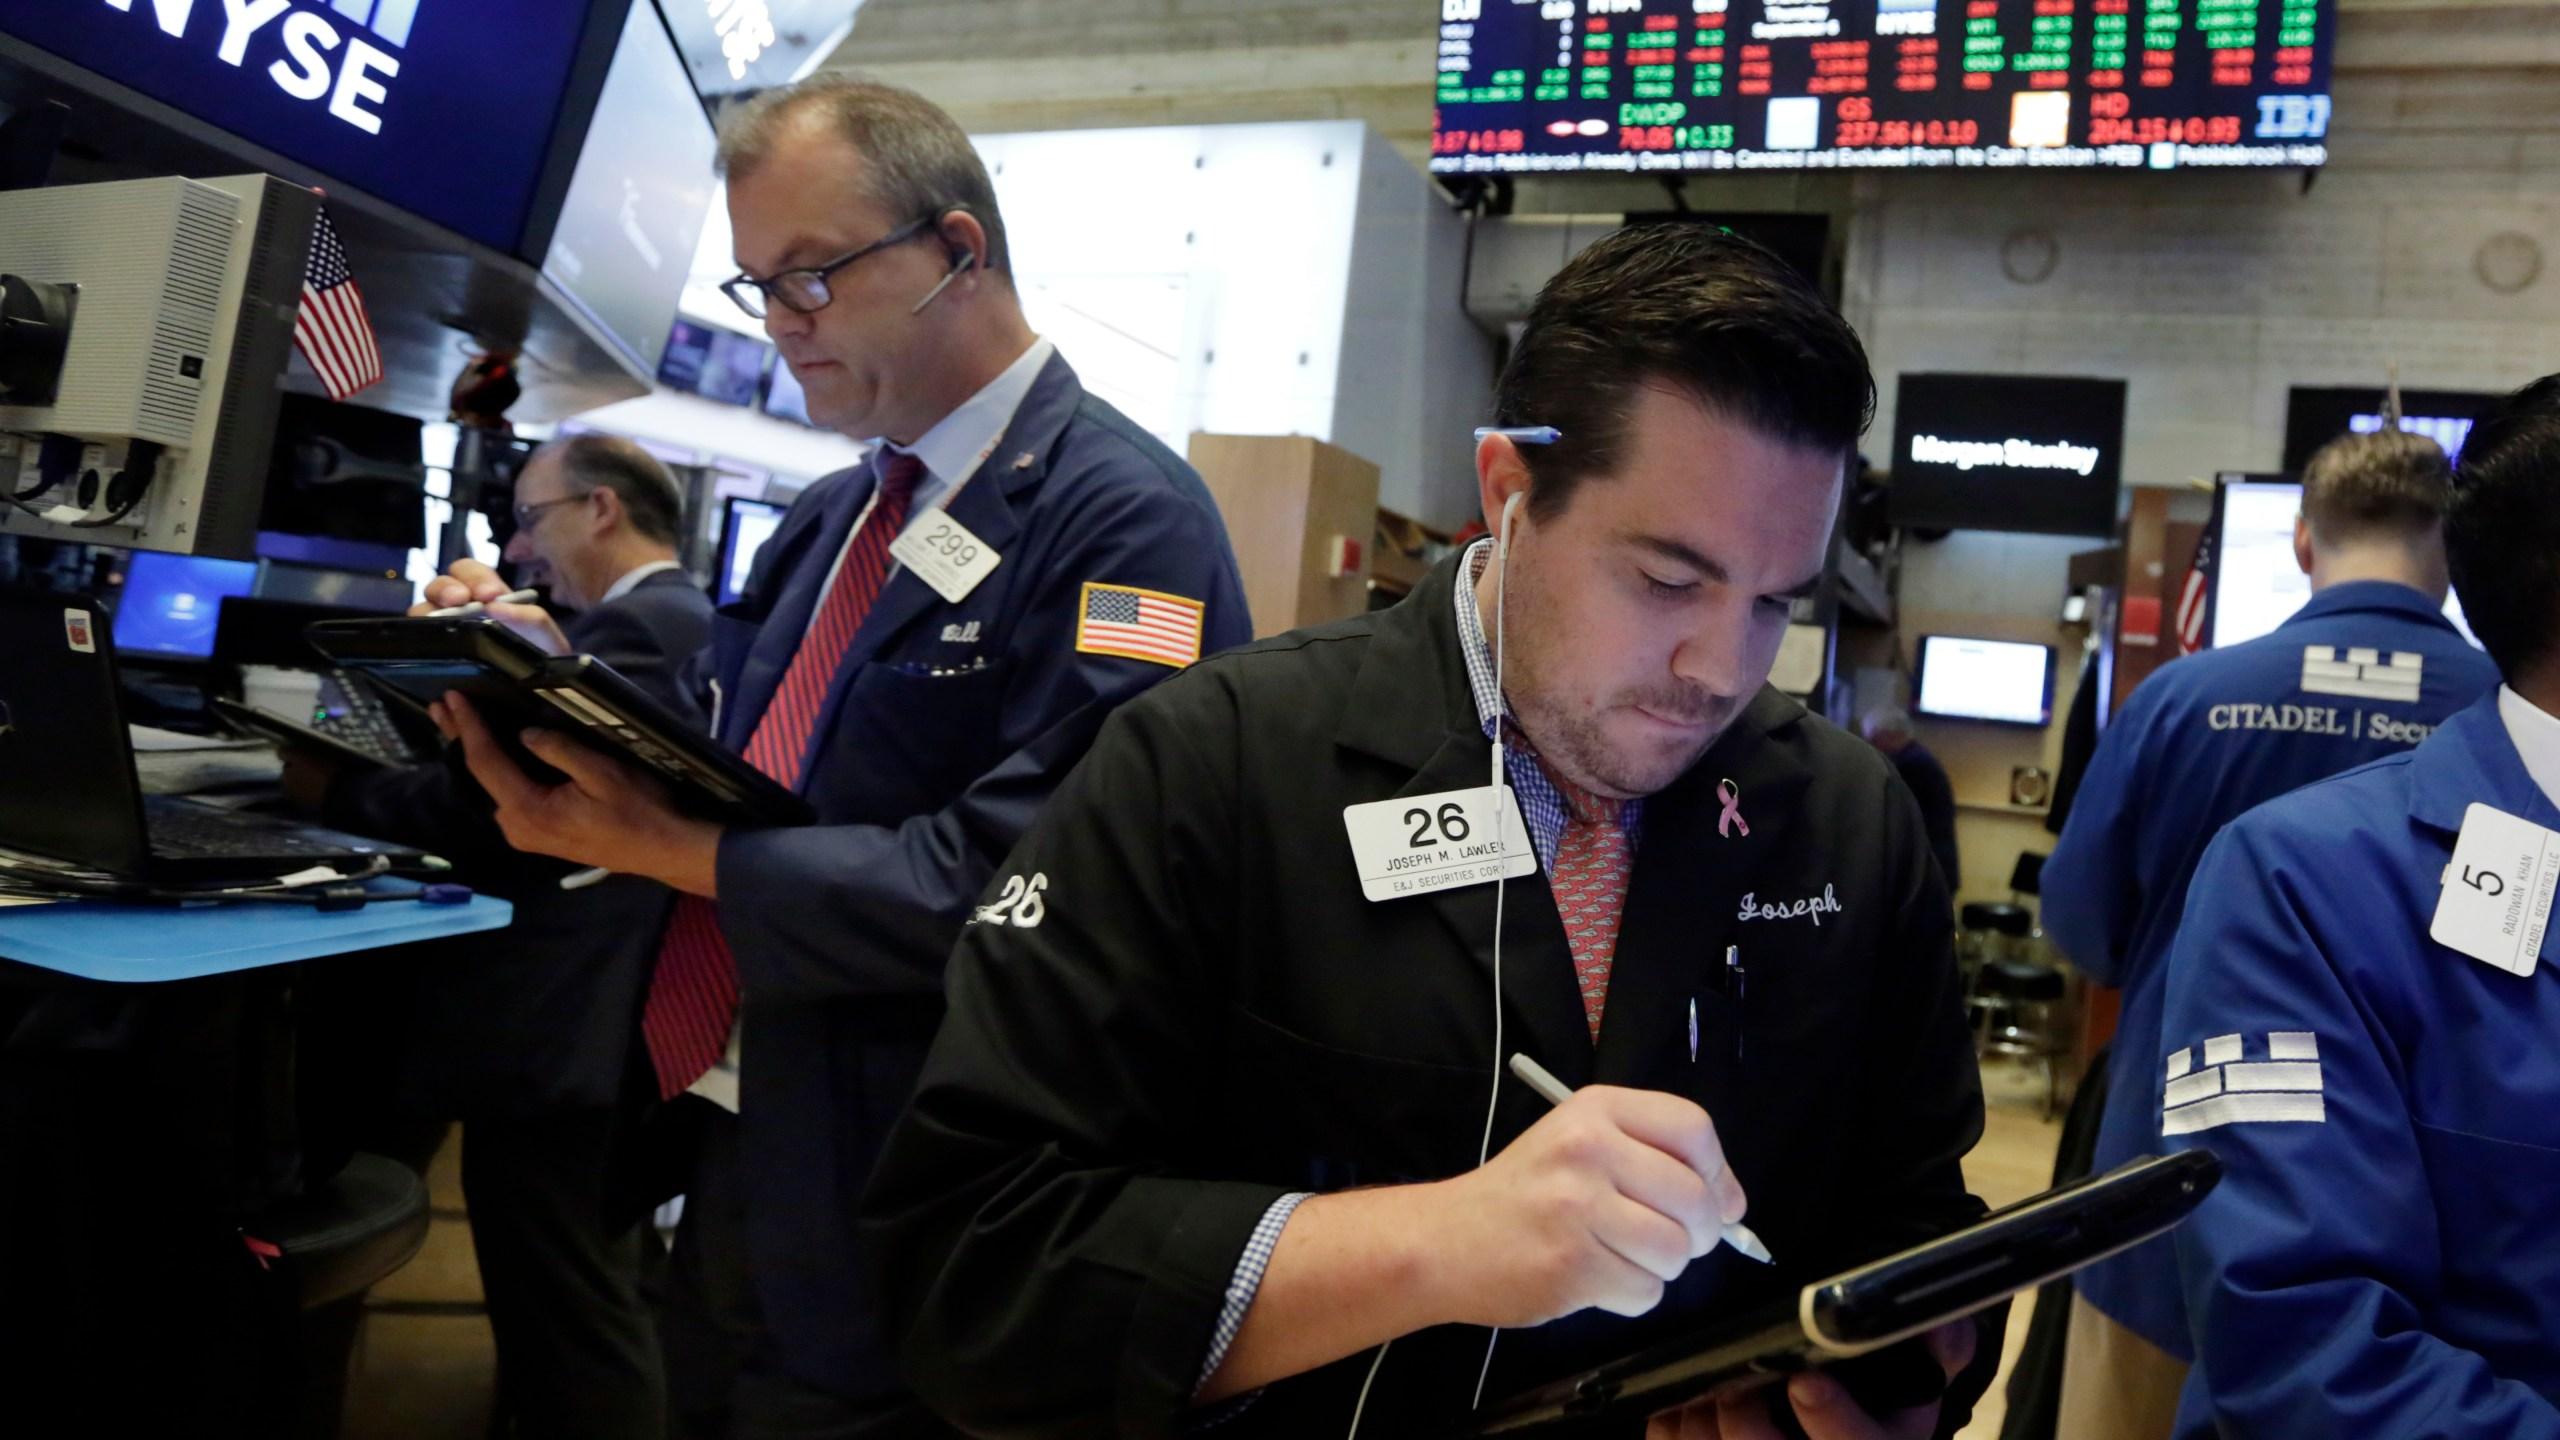 Financial_Markets_Wall_Street_02812-159532.jpg97845929